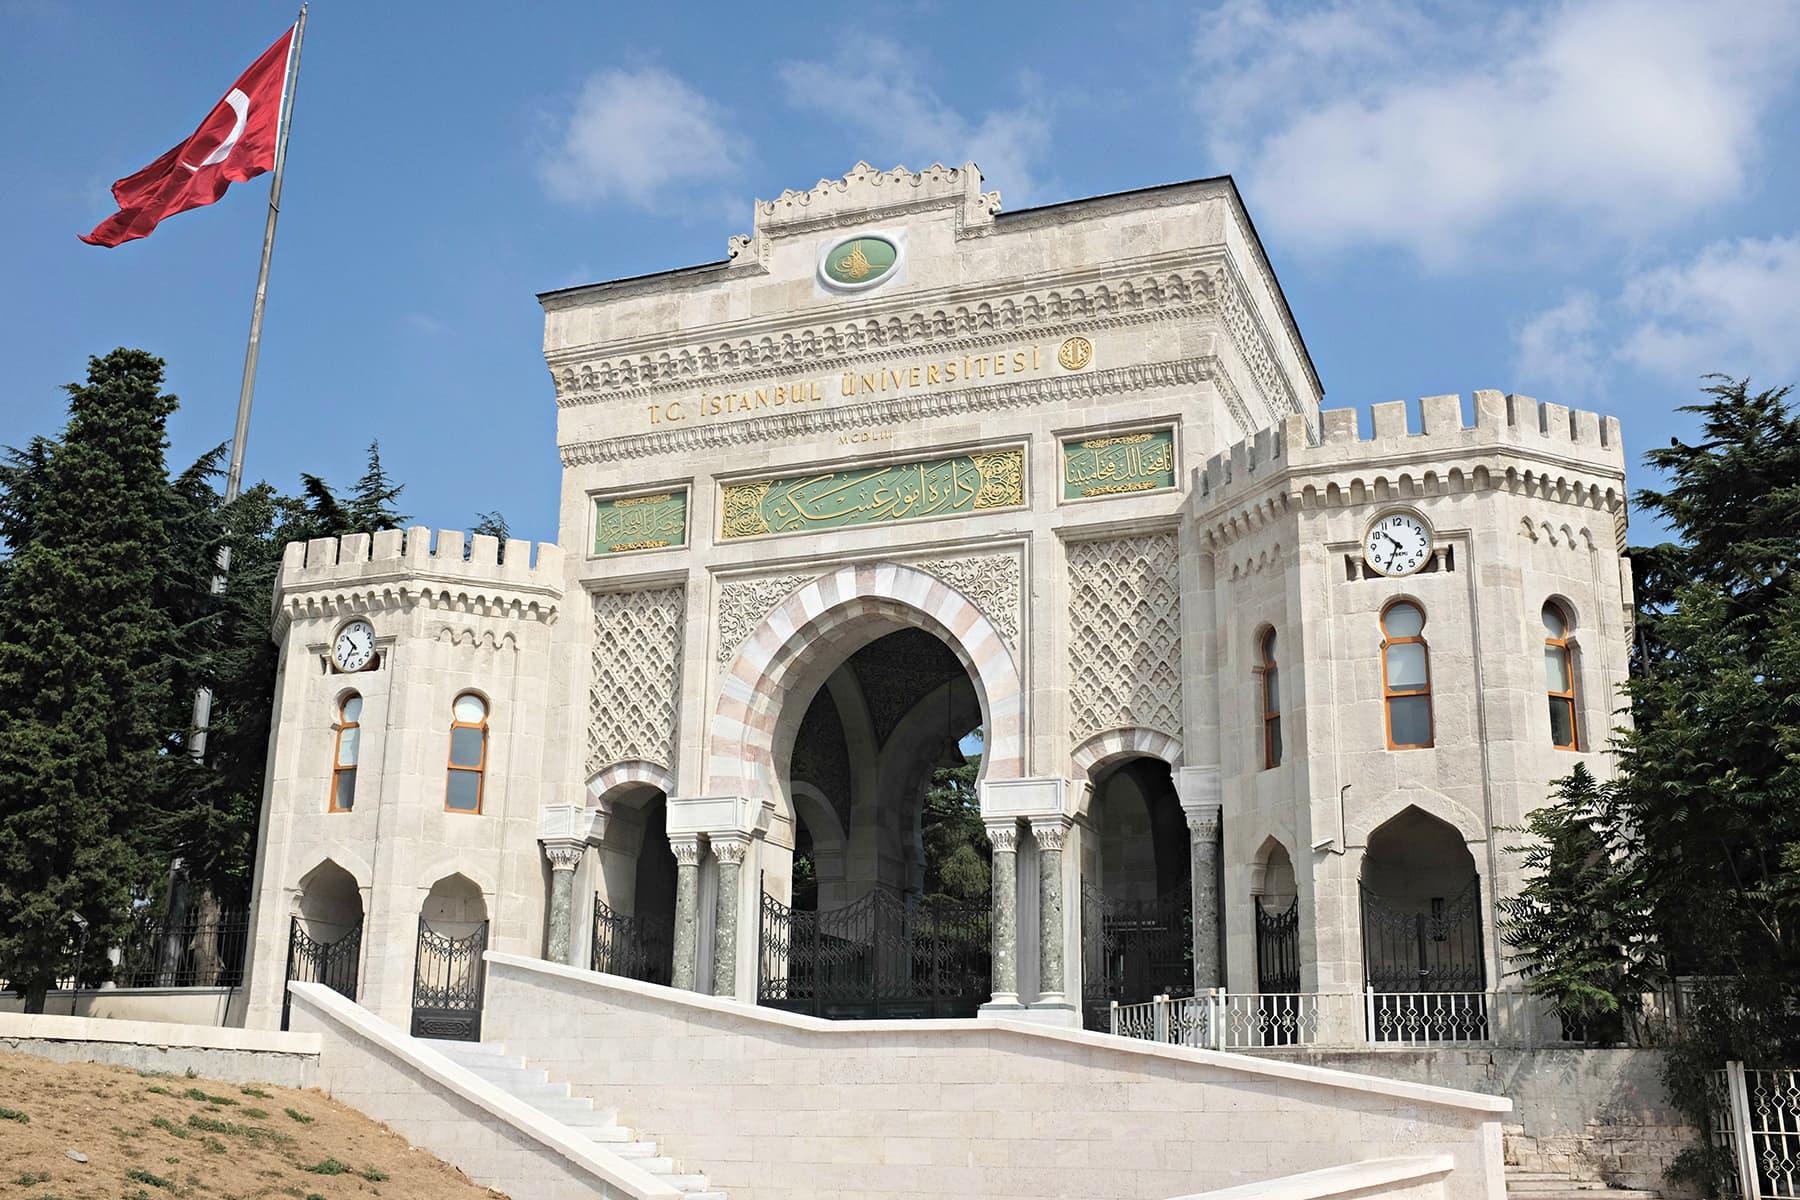 The Istanbul University entrance.